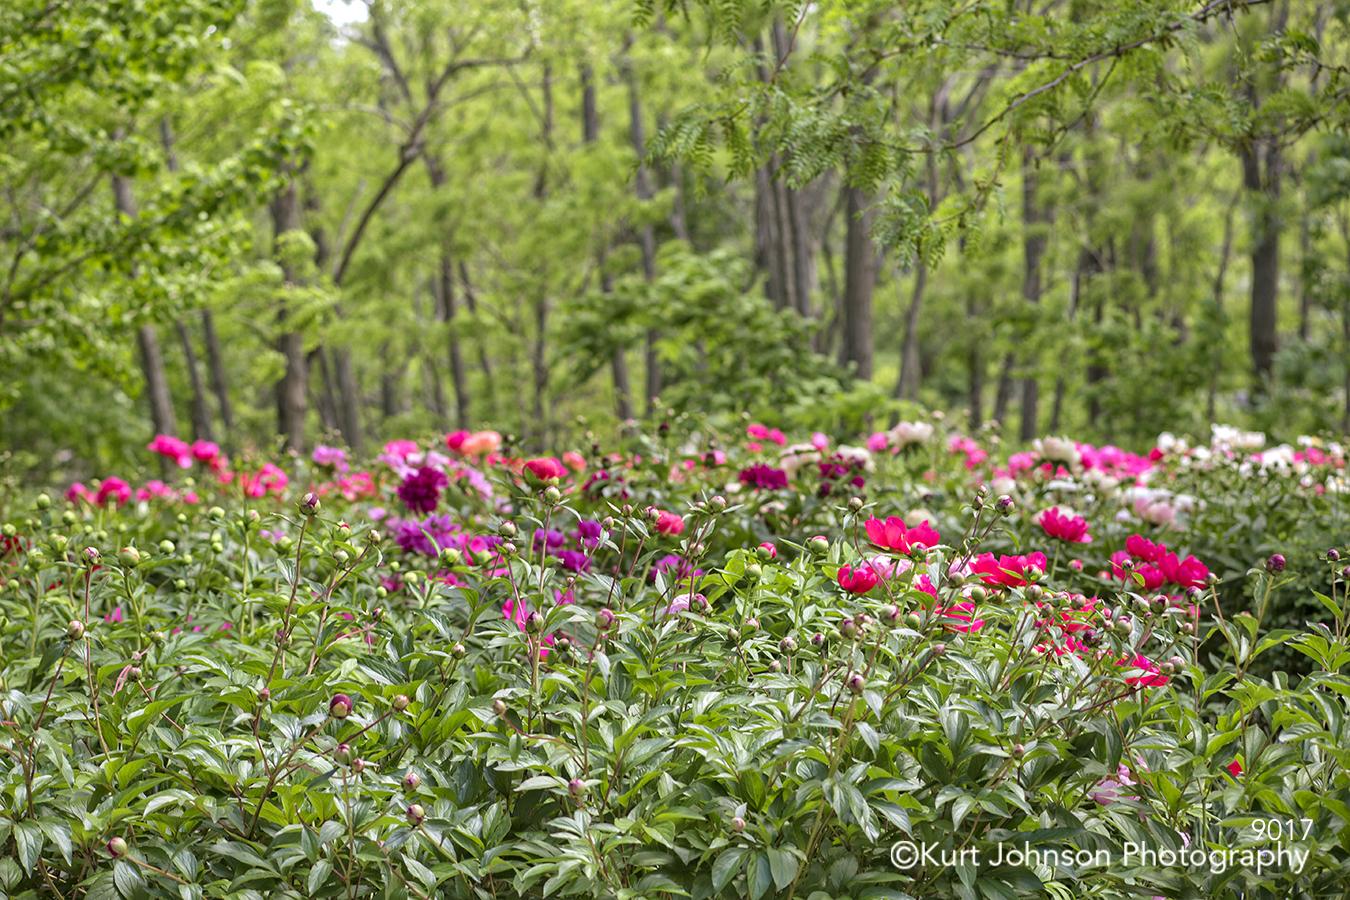 green grass grasses flower field trees wildflowers meadow pink flowers